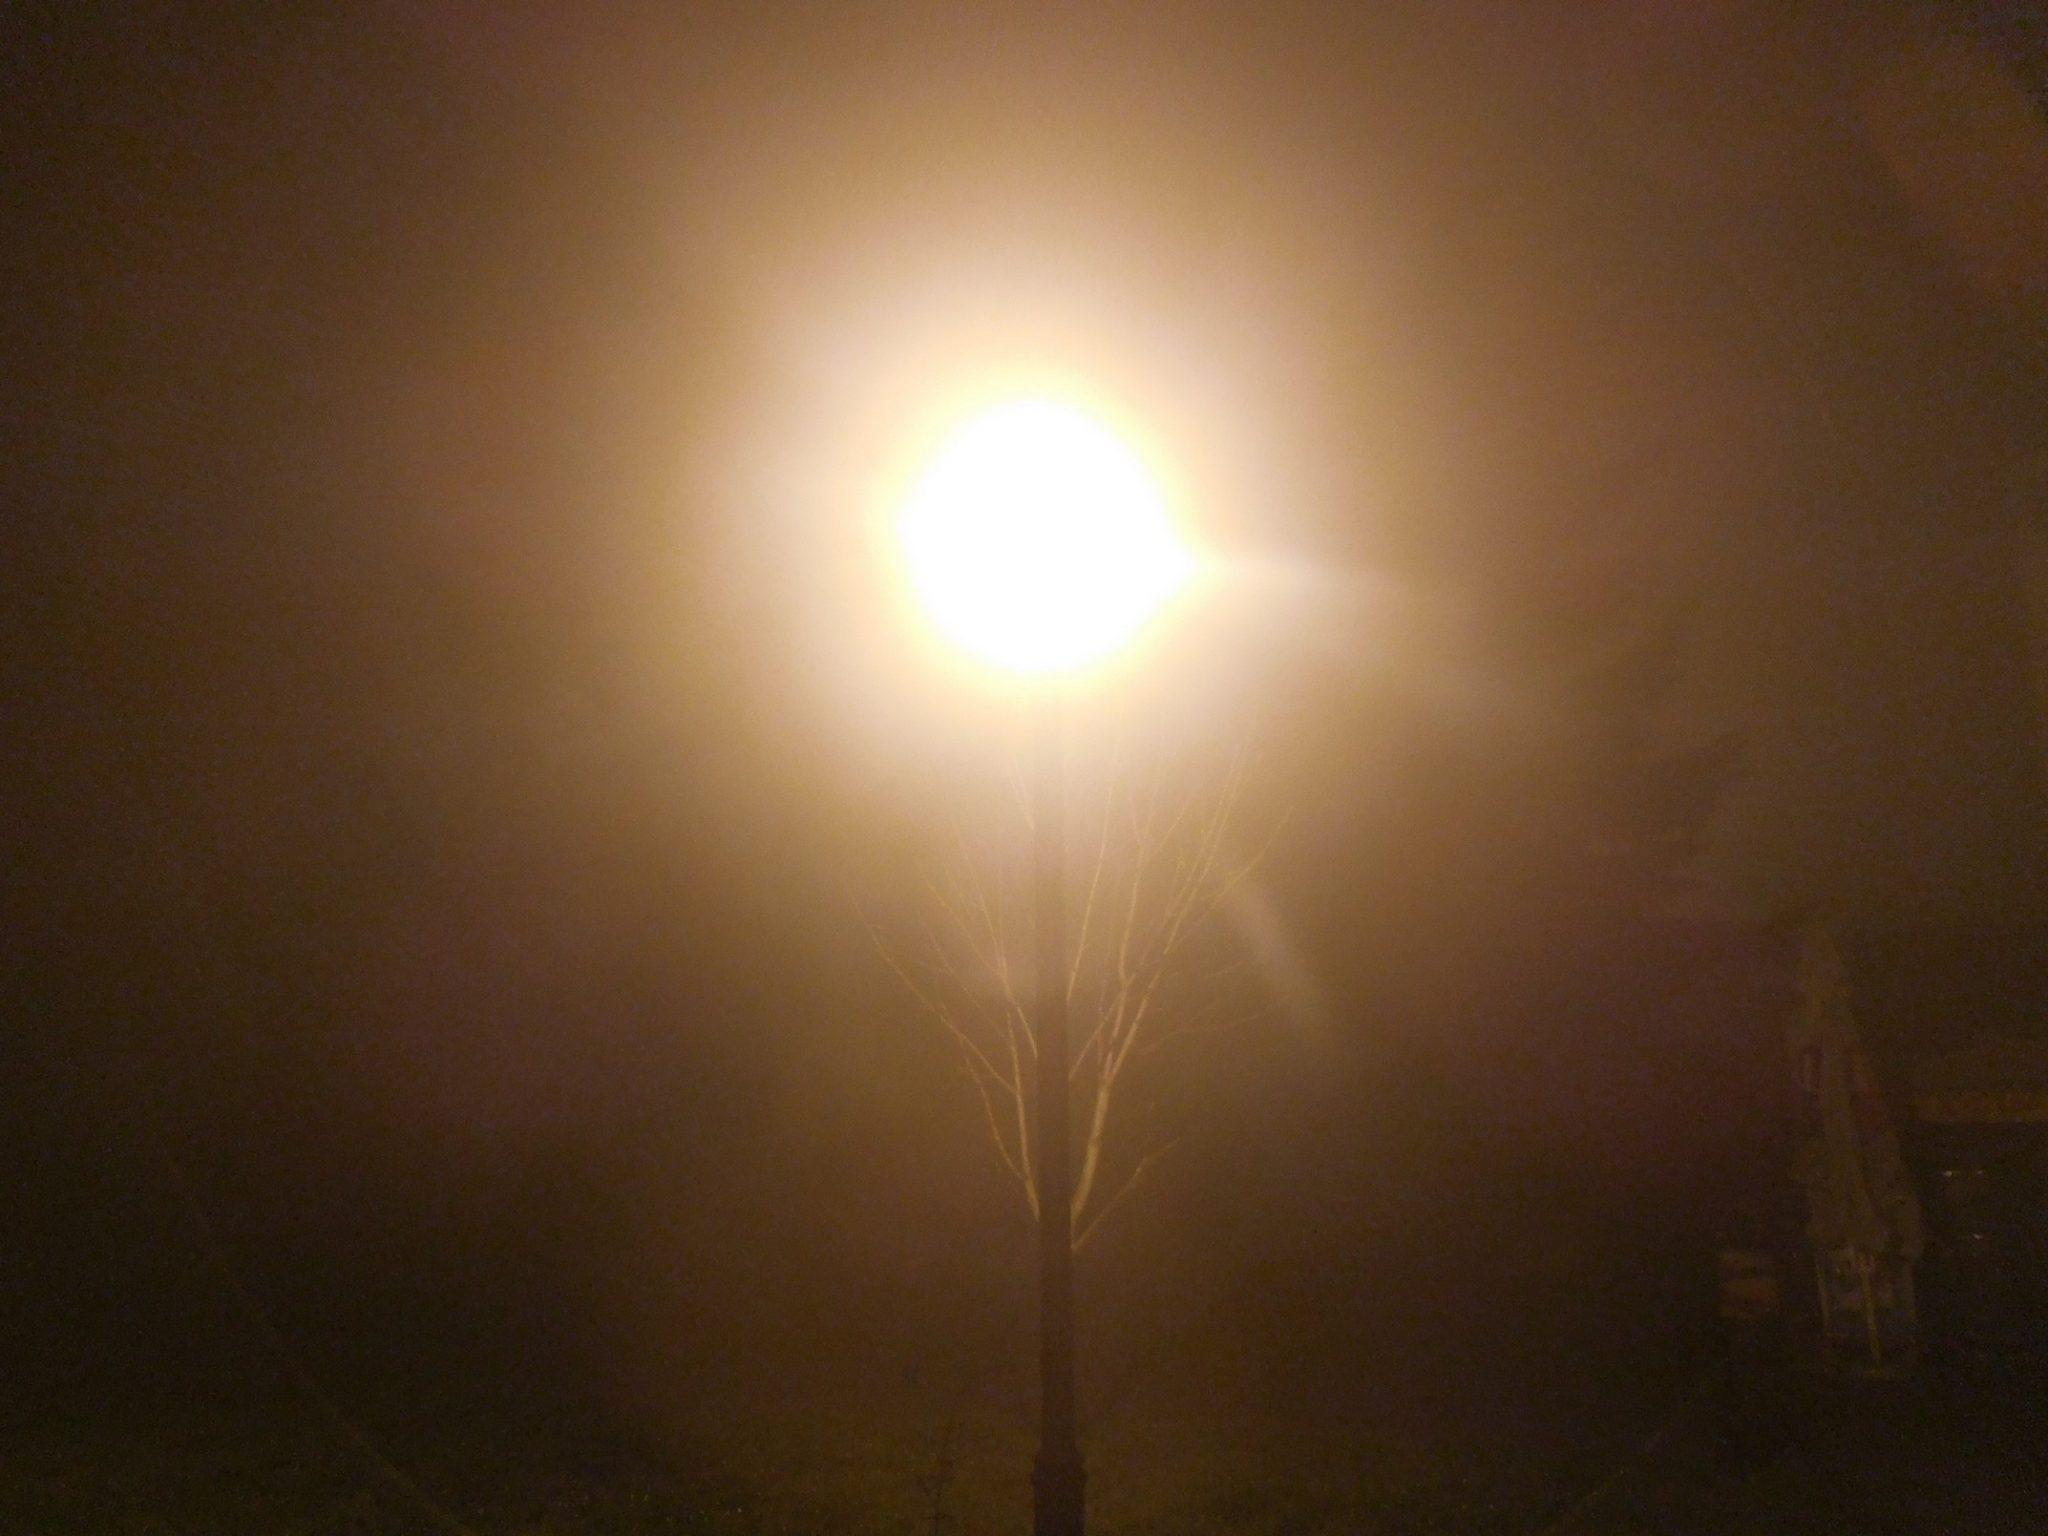 Belgrade, Kalemegdan, Tesla Coil Light, Serbia